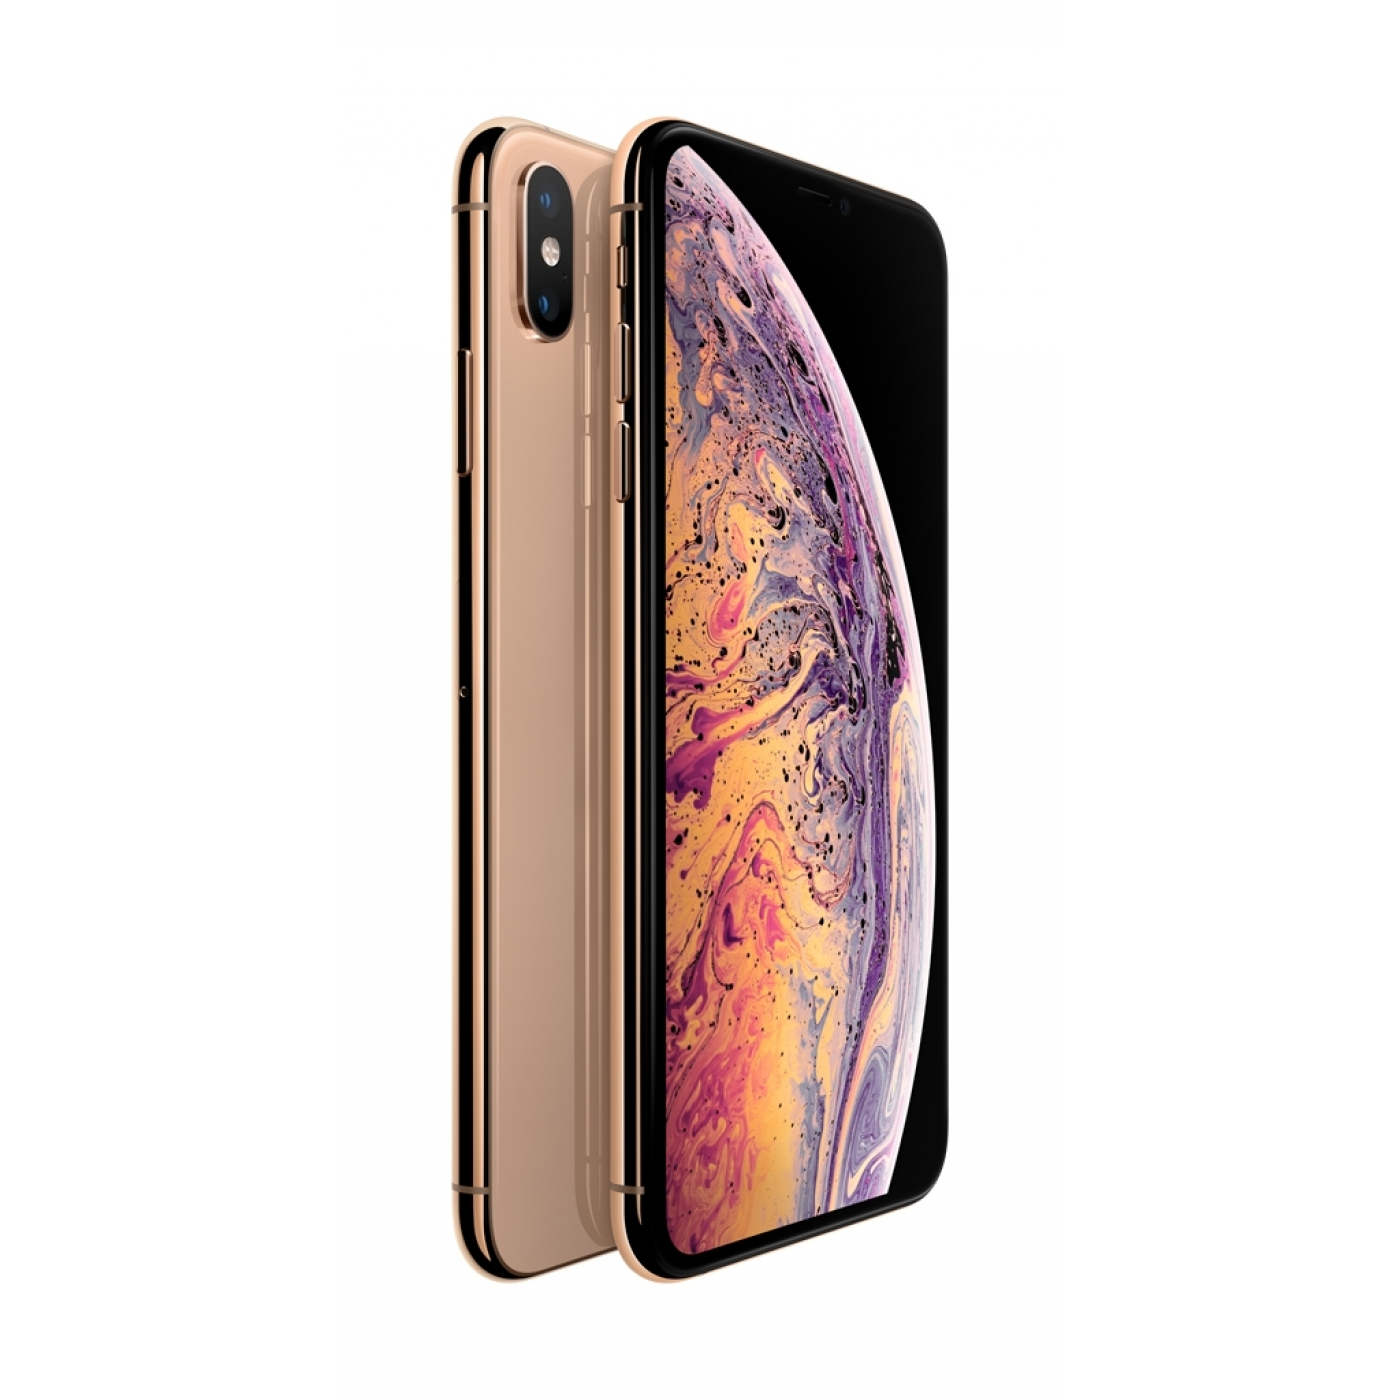 Apple iPhone XS Max 64GB Gold.